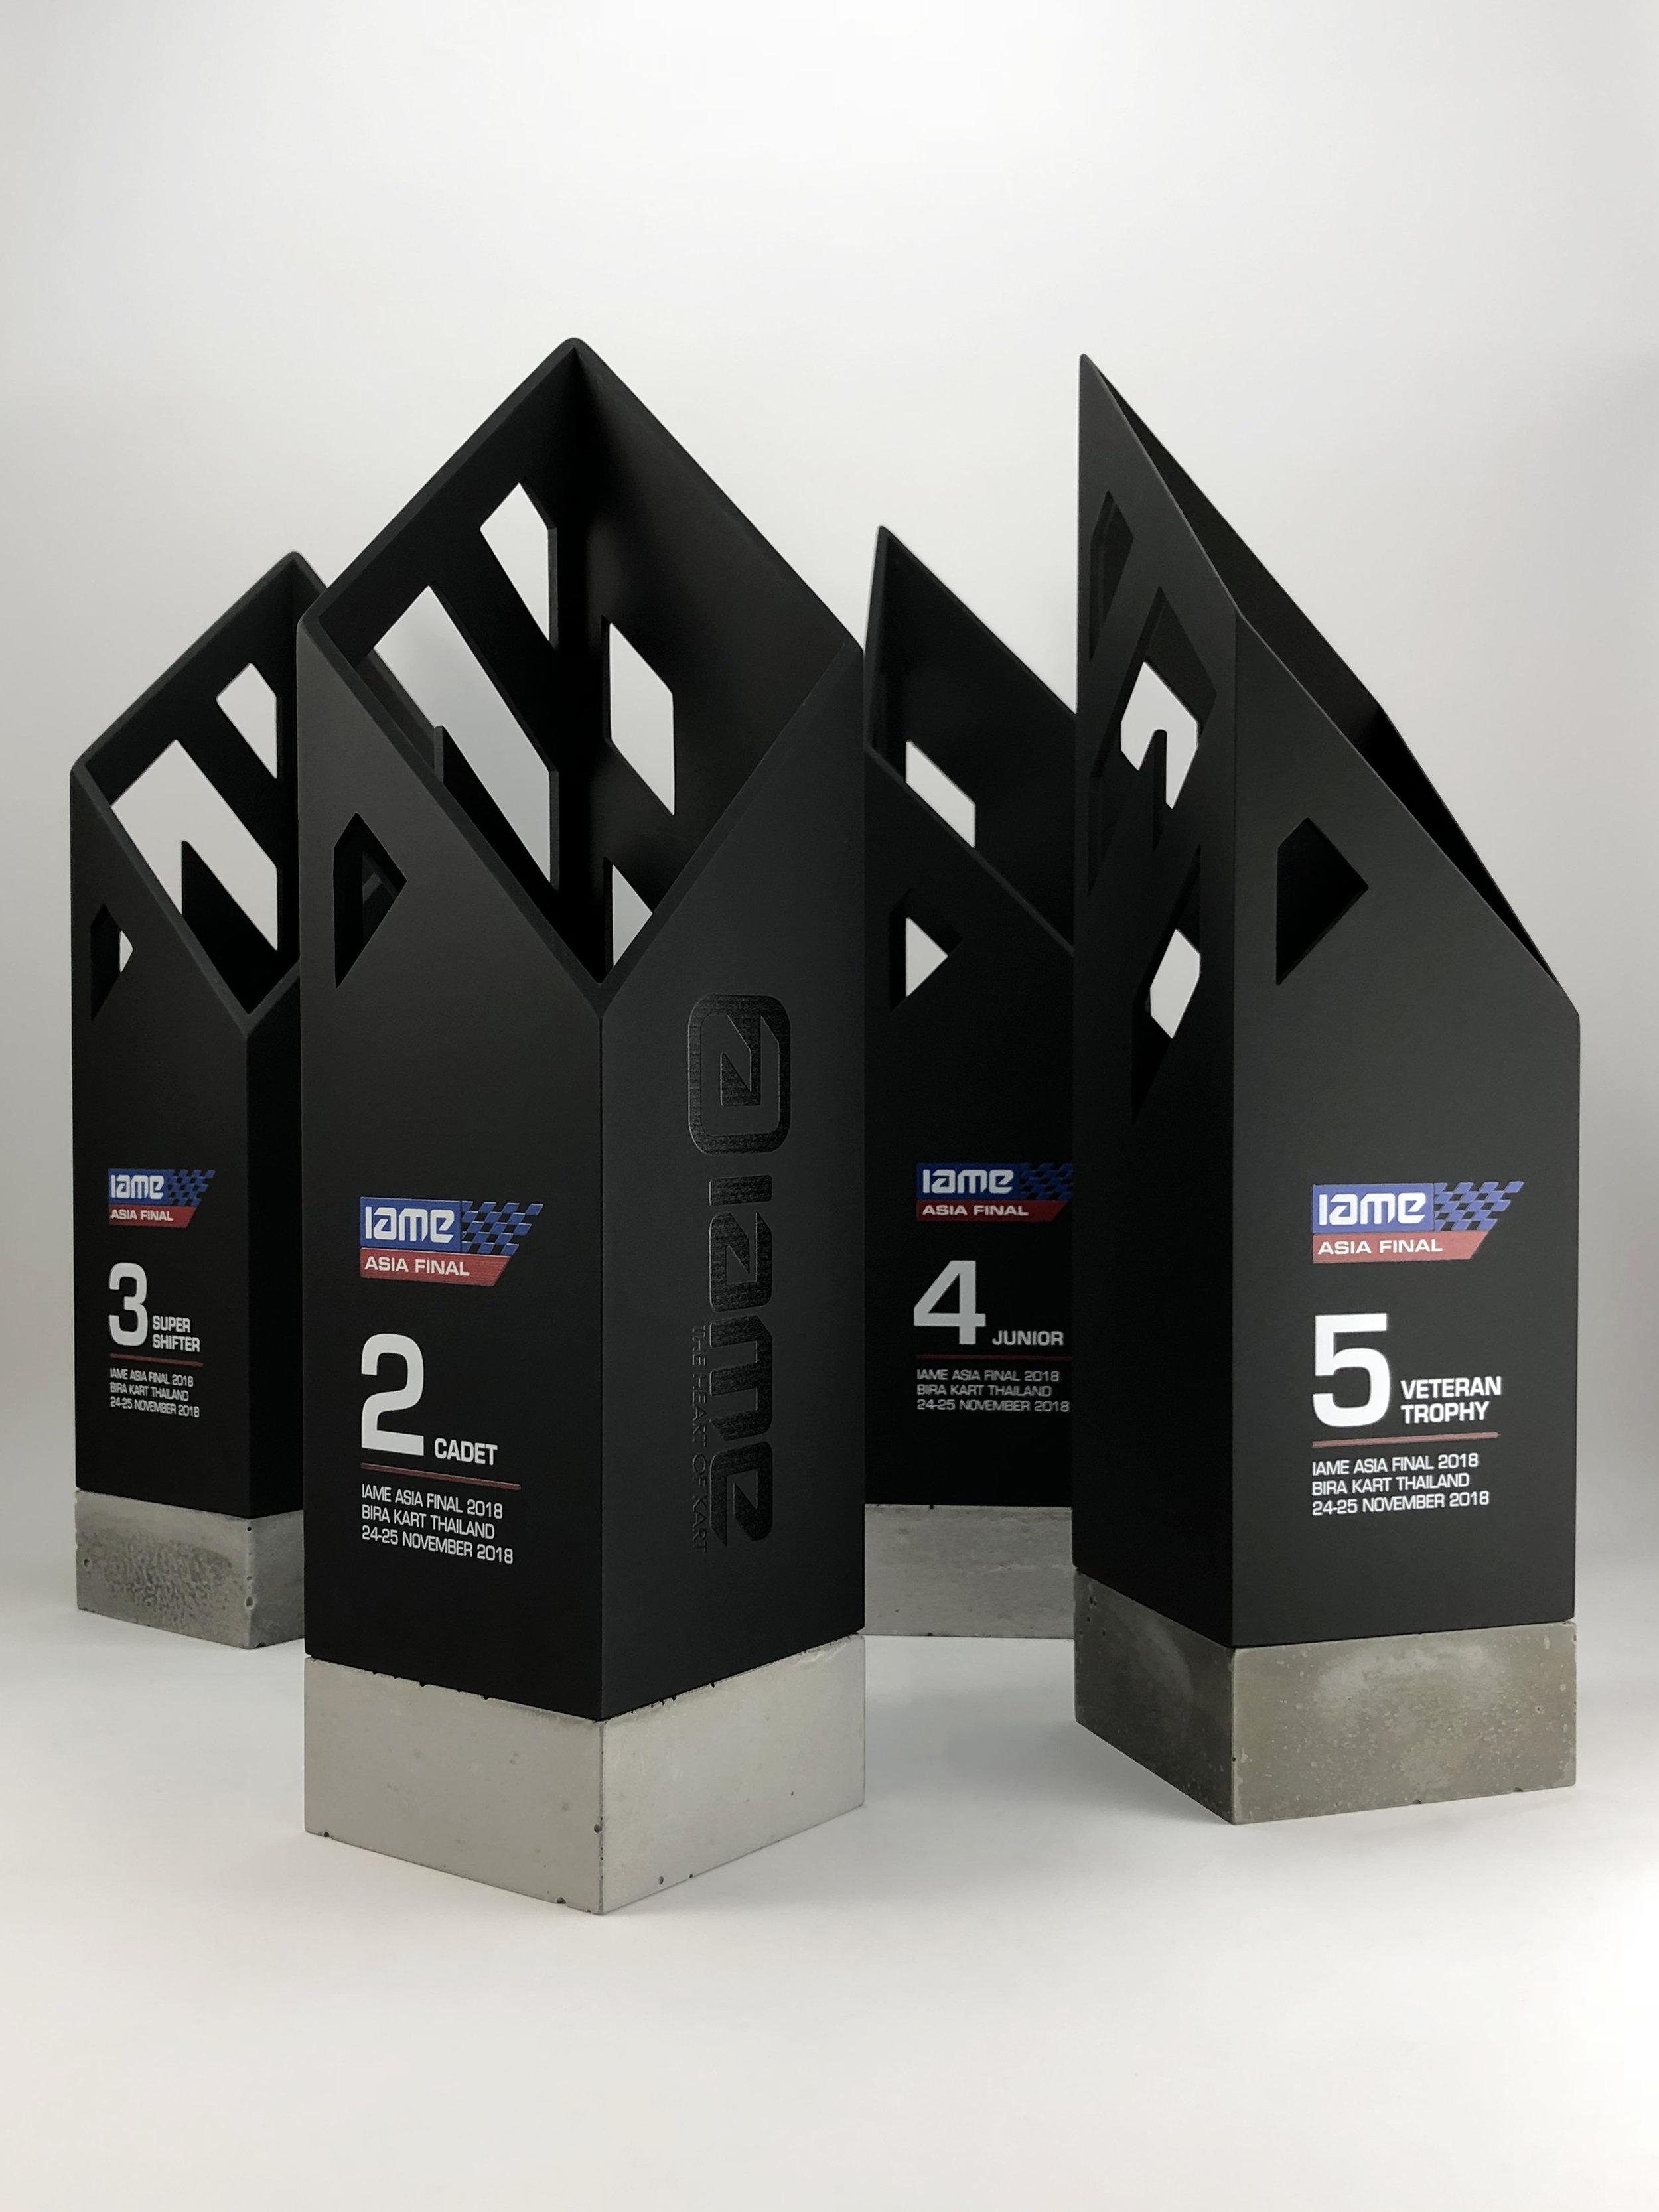 iAME-asia-final-race-trophy-metal-cement-relief-cut-award-01.jpg